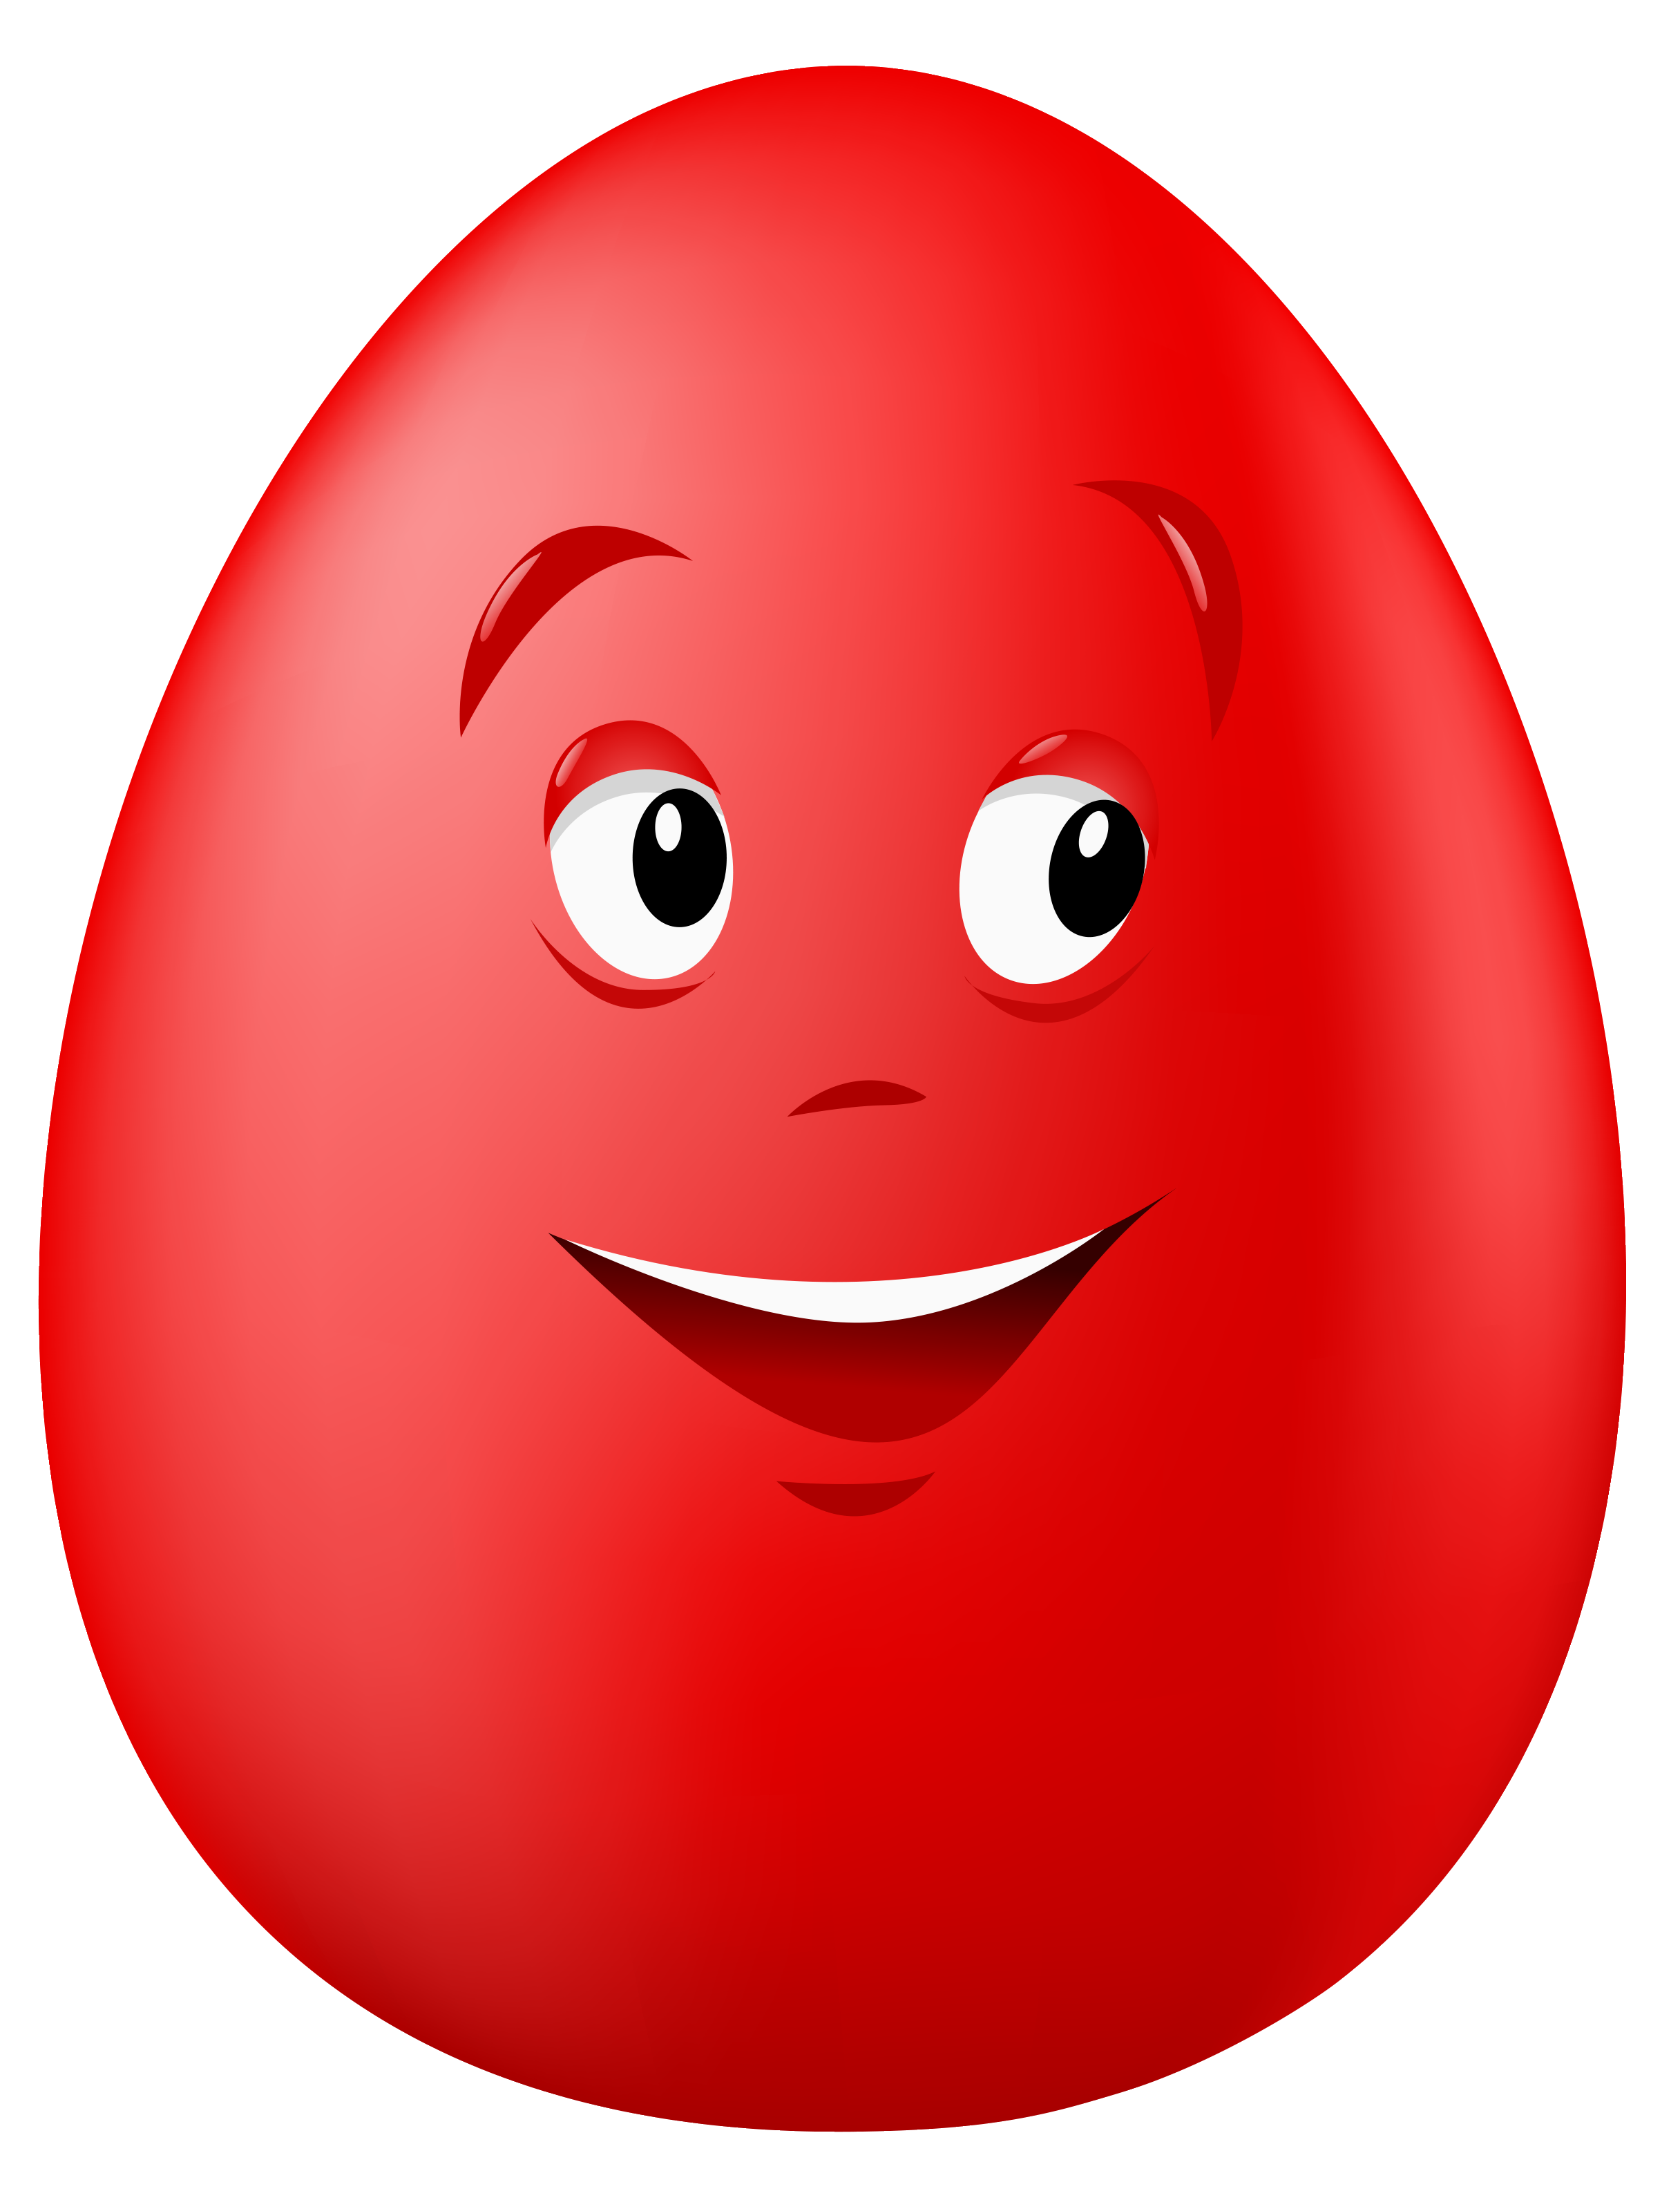 vector transparent stock Smiling clipart red. Transparent easter egg png